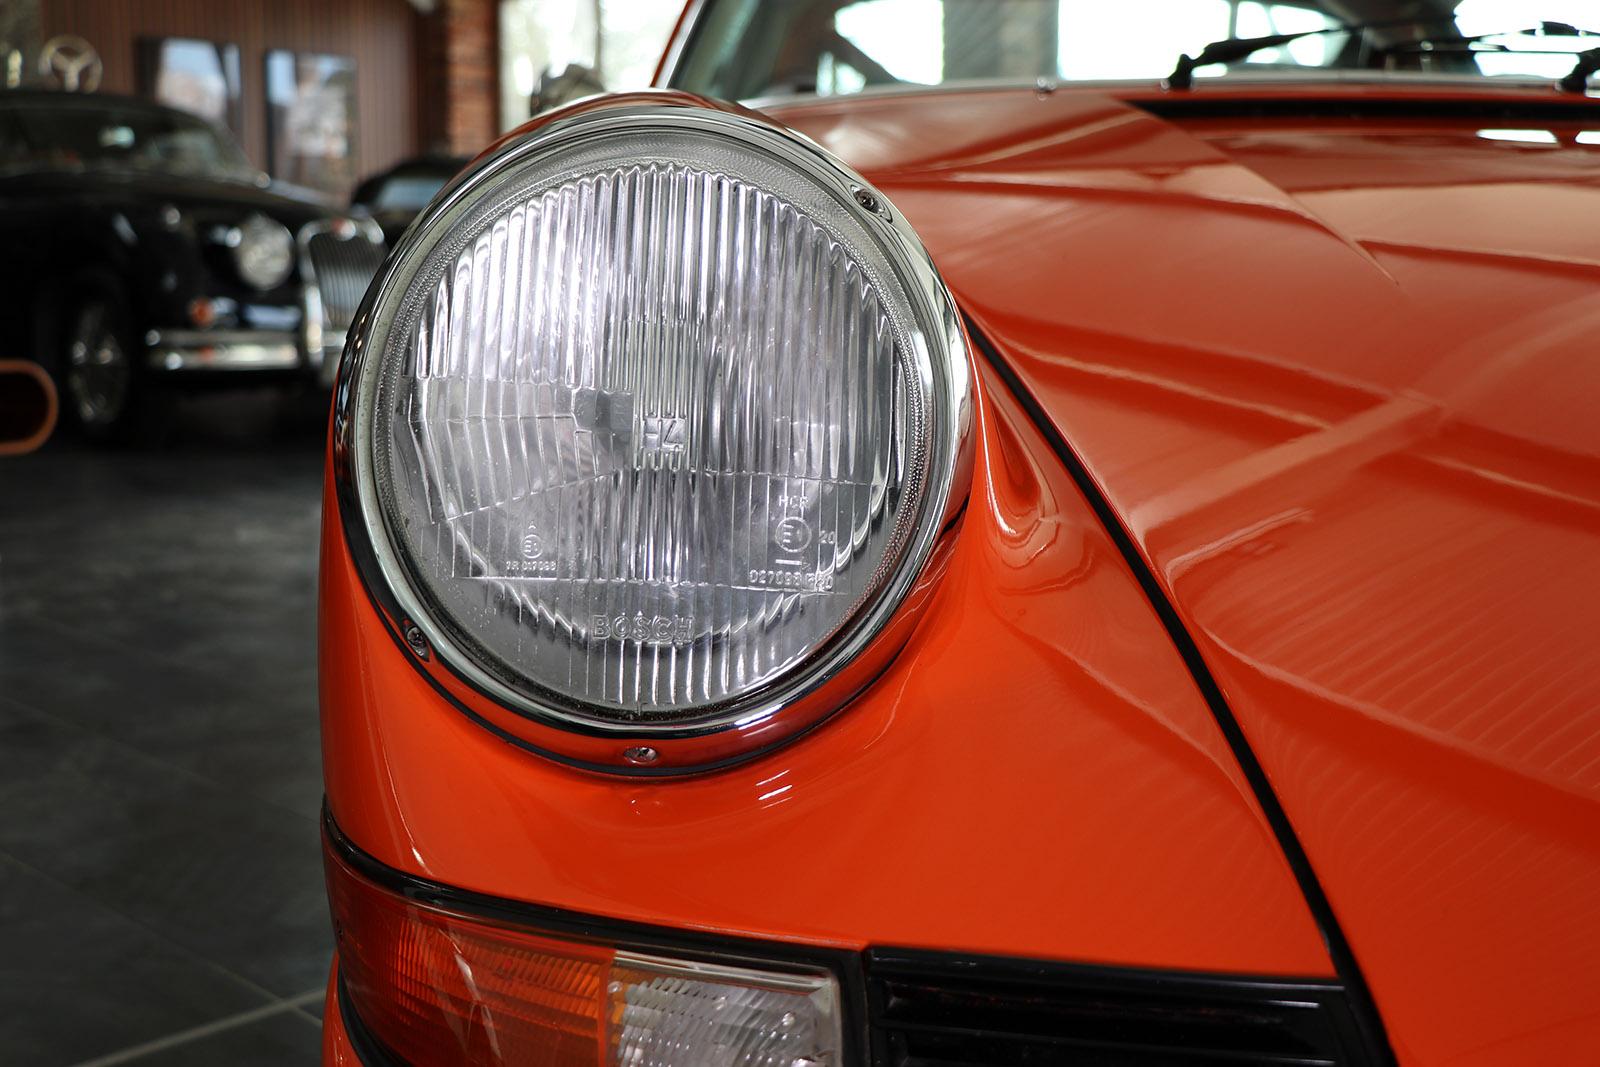 1972-Porsche 911 S-orange-evocation-sayer selection-3-web.jpg